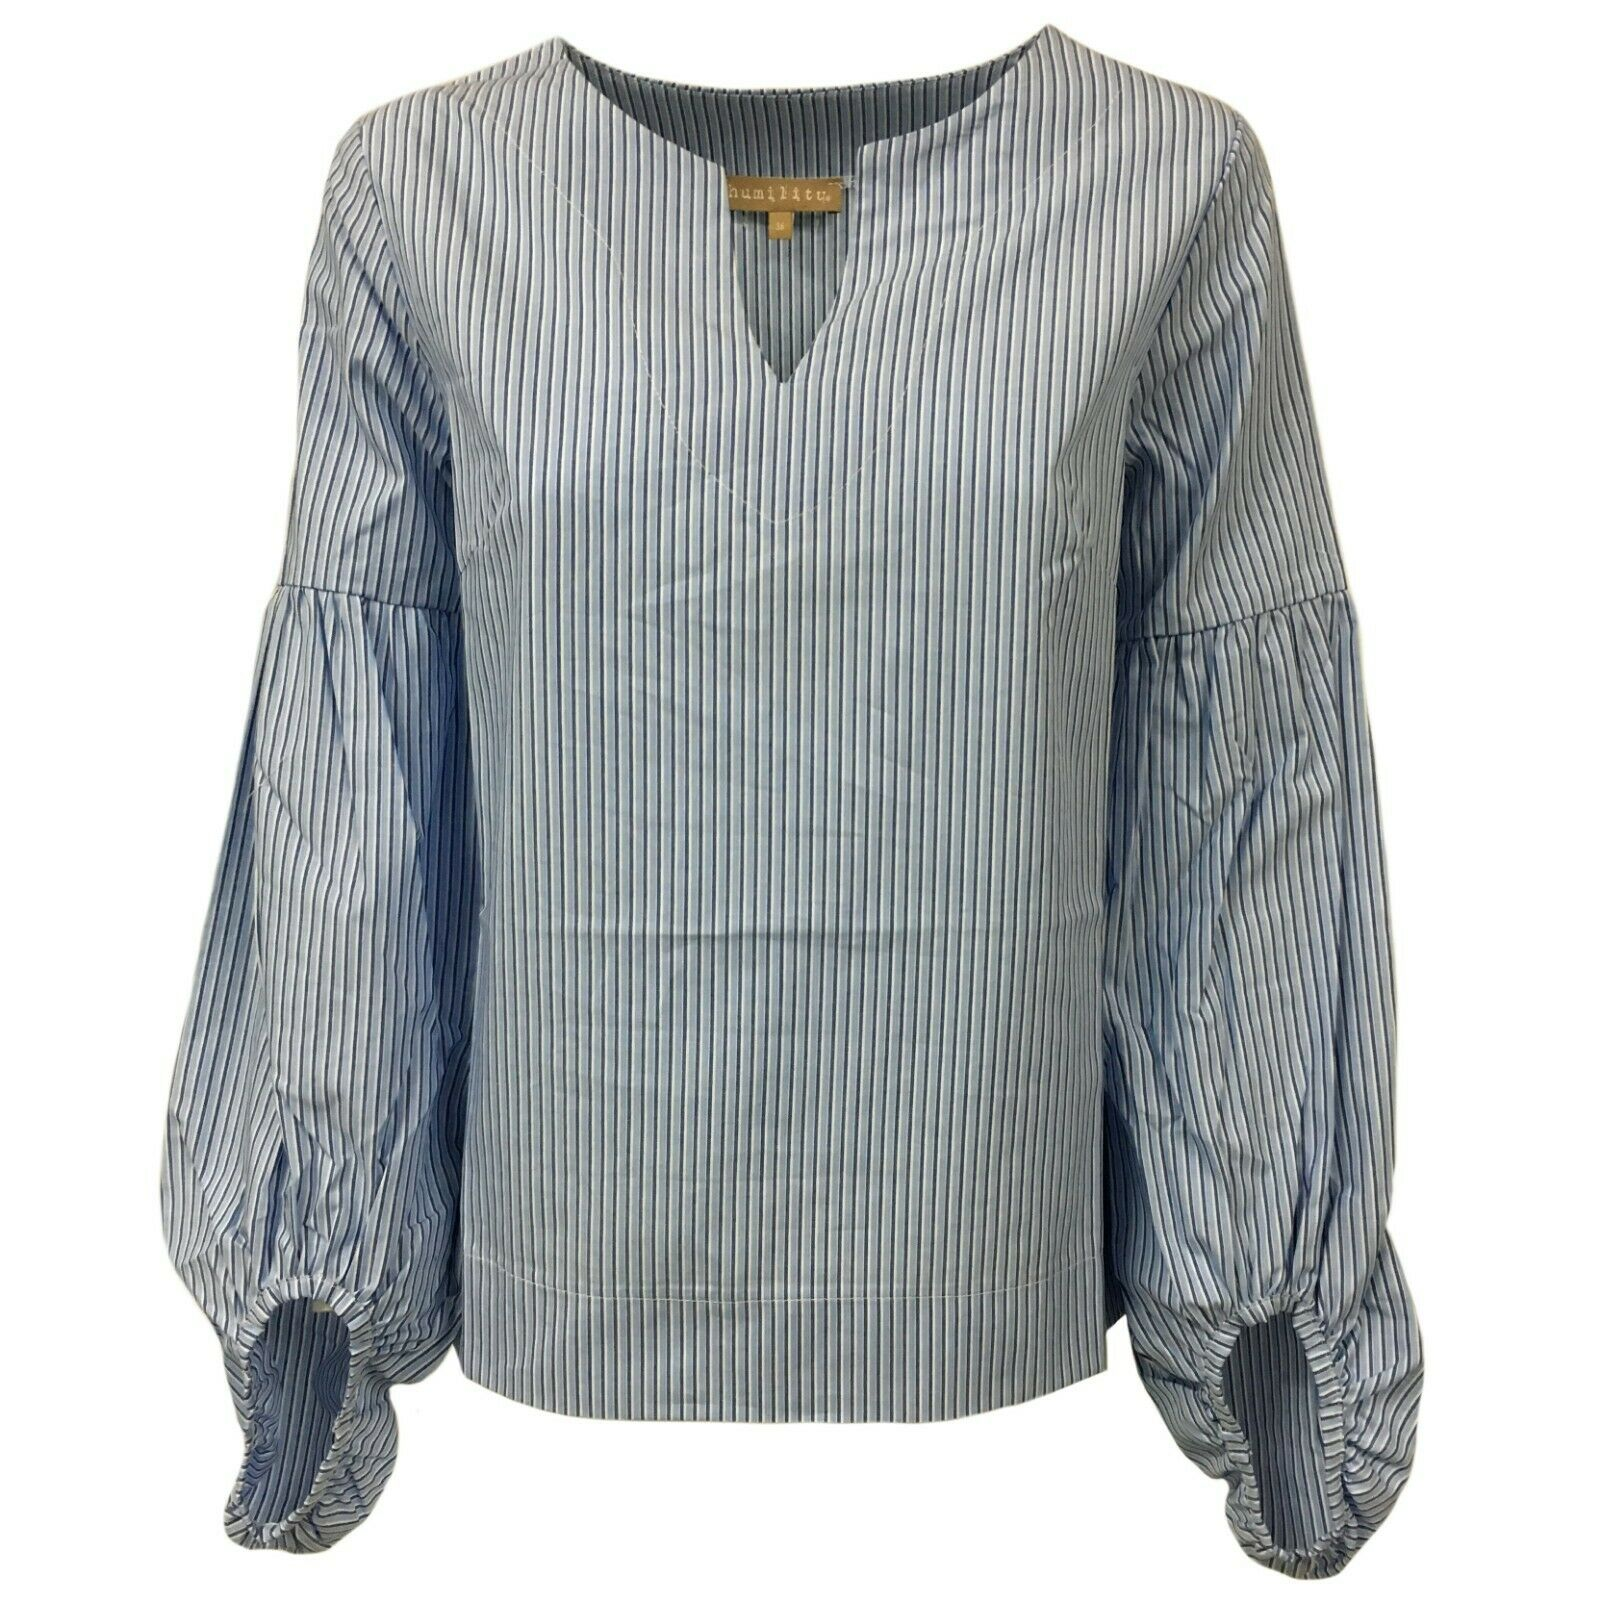 HUMILITY 1949 Damenhemd Streifen blau mod HA8087 100% Baumwolle MADE IN ITALY